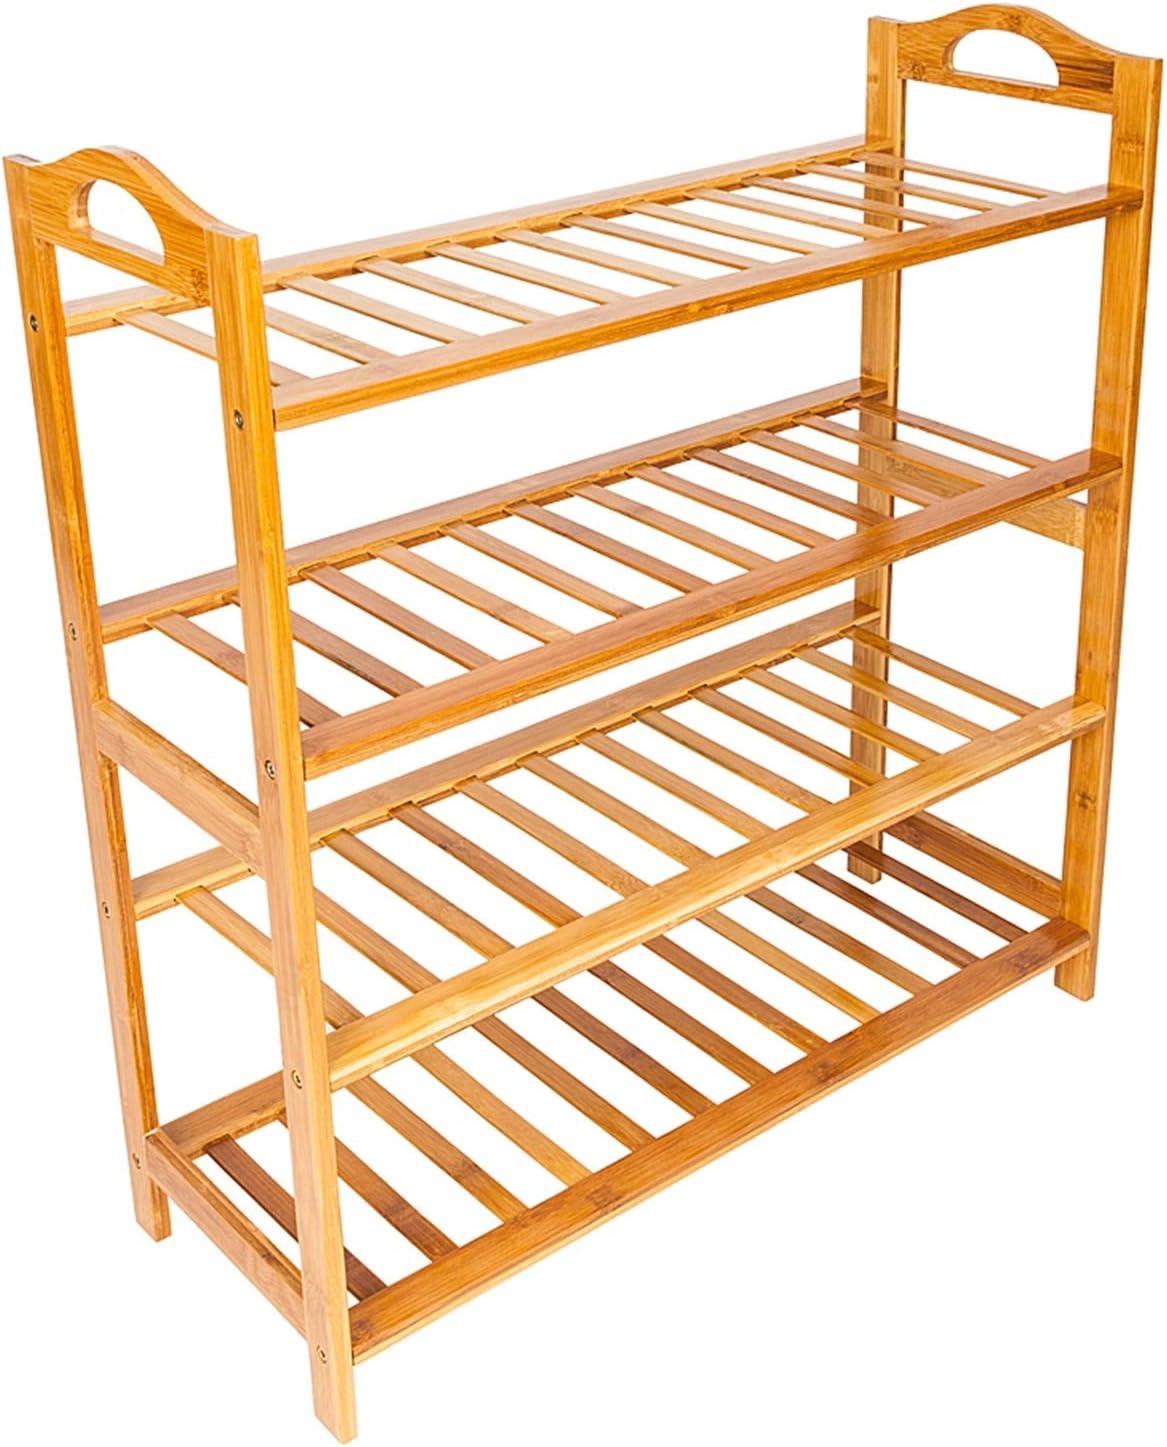 Riyyow Bamboo 5% Brand Cheap Sale Venue OFF Shoe Rack Concise 12-Batten 4 Tiers Shelf F